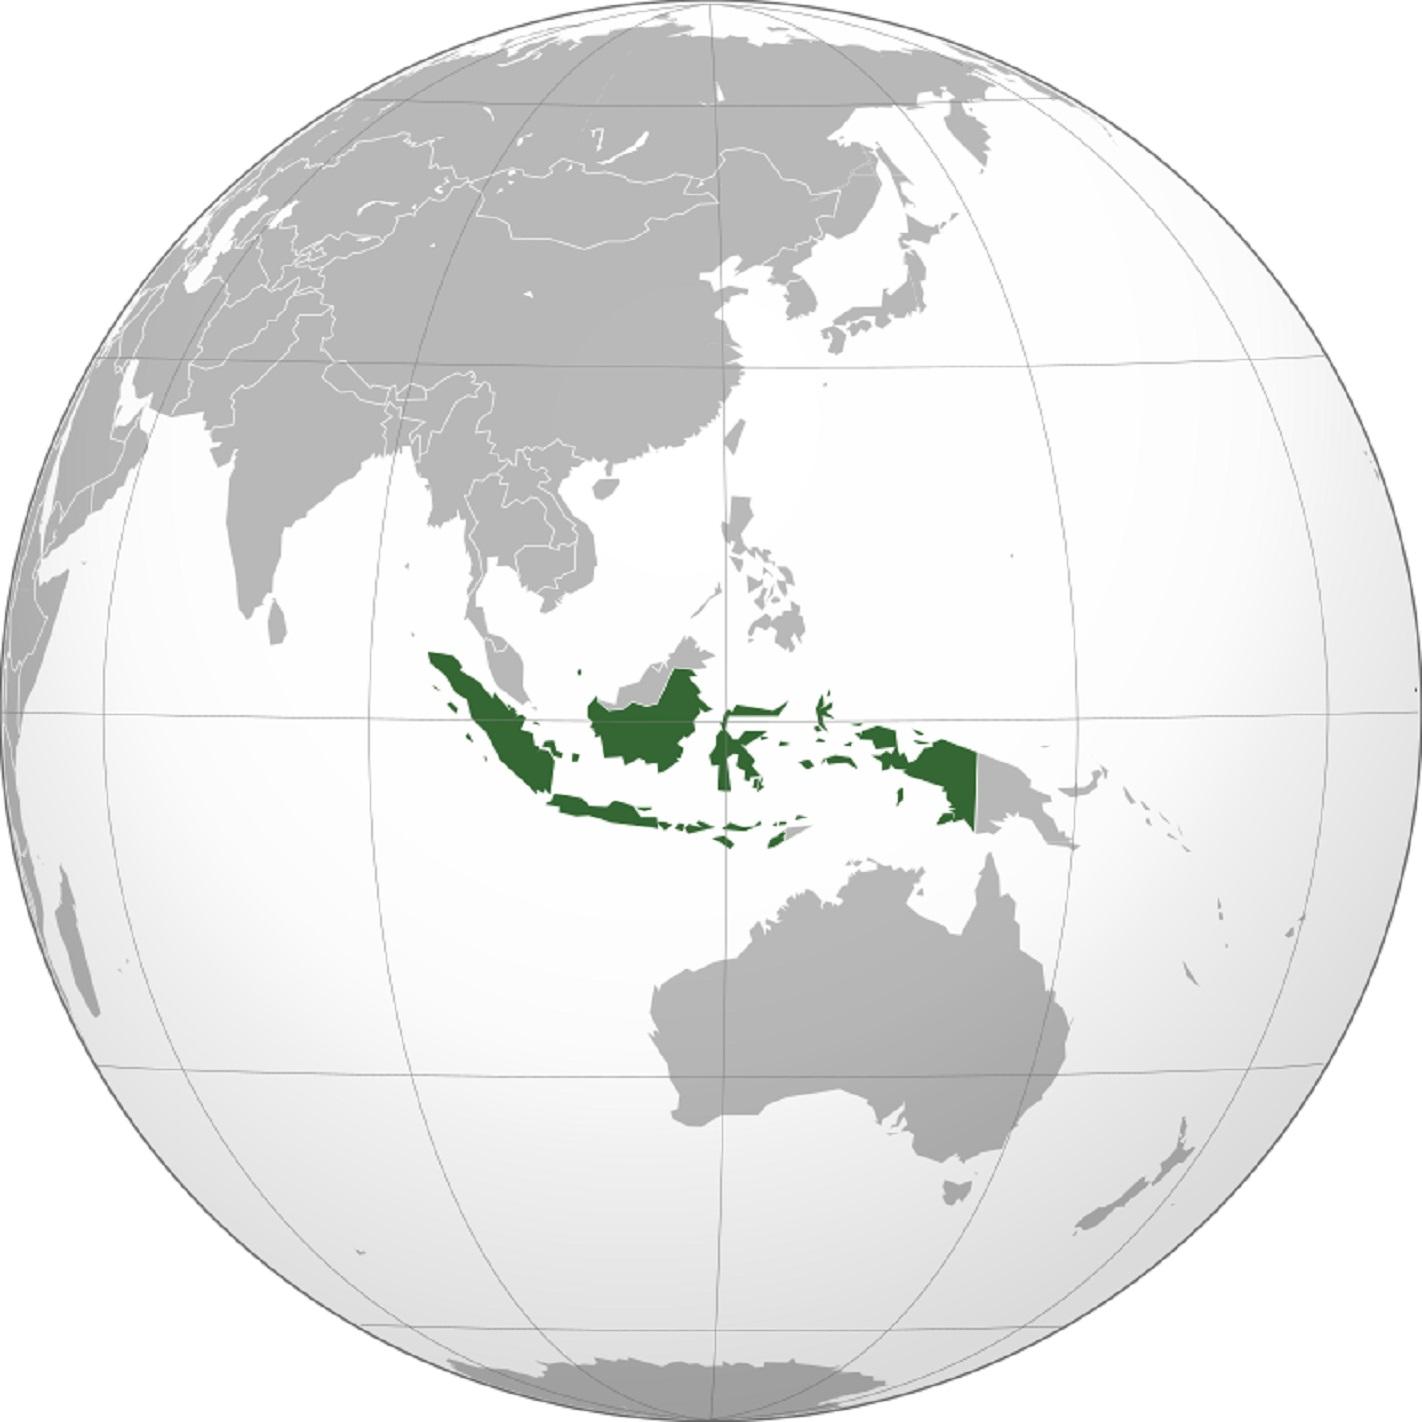 indonesialocation